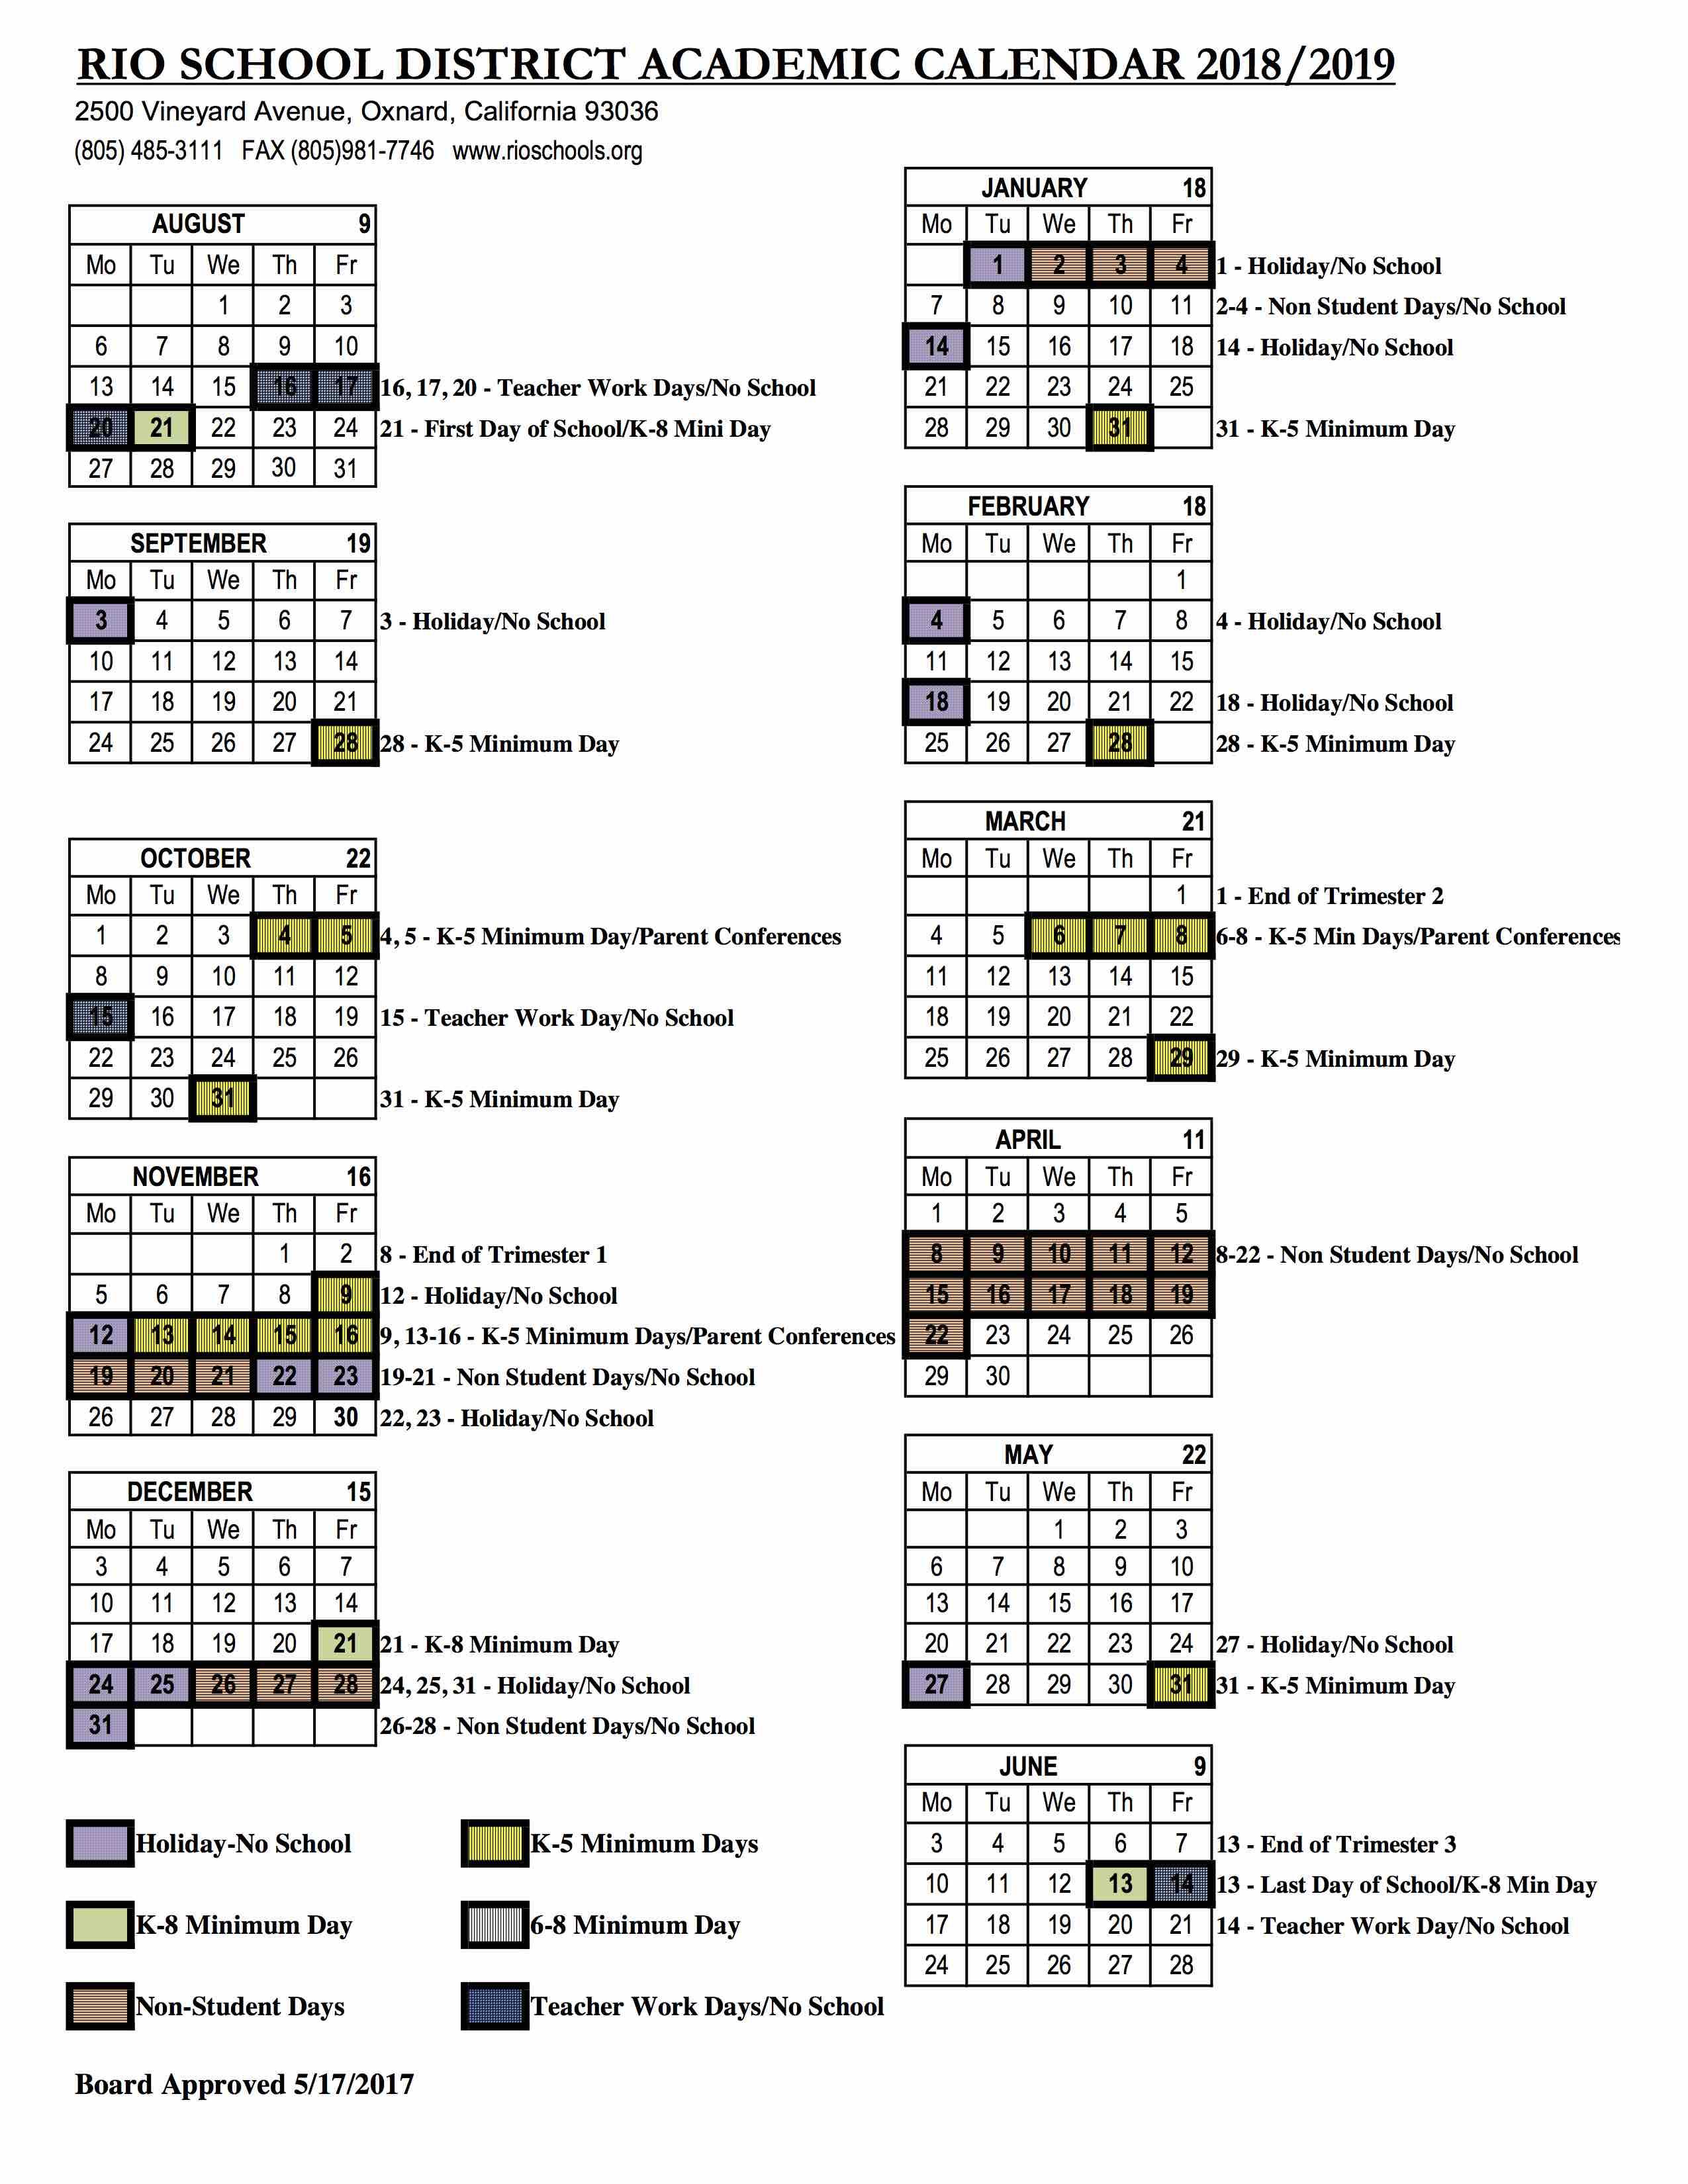 2018 2019 academic calendar rio school district